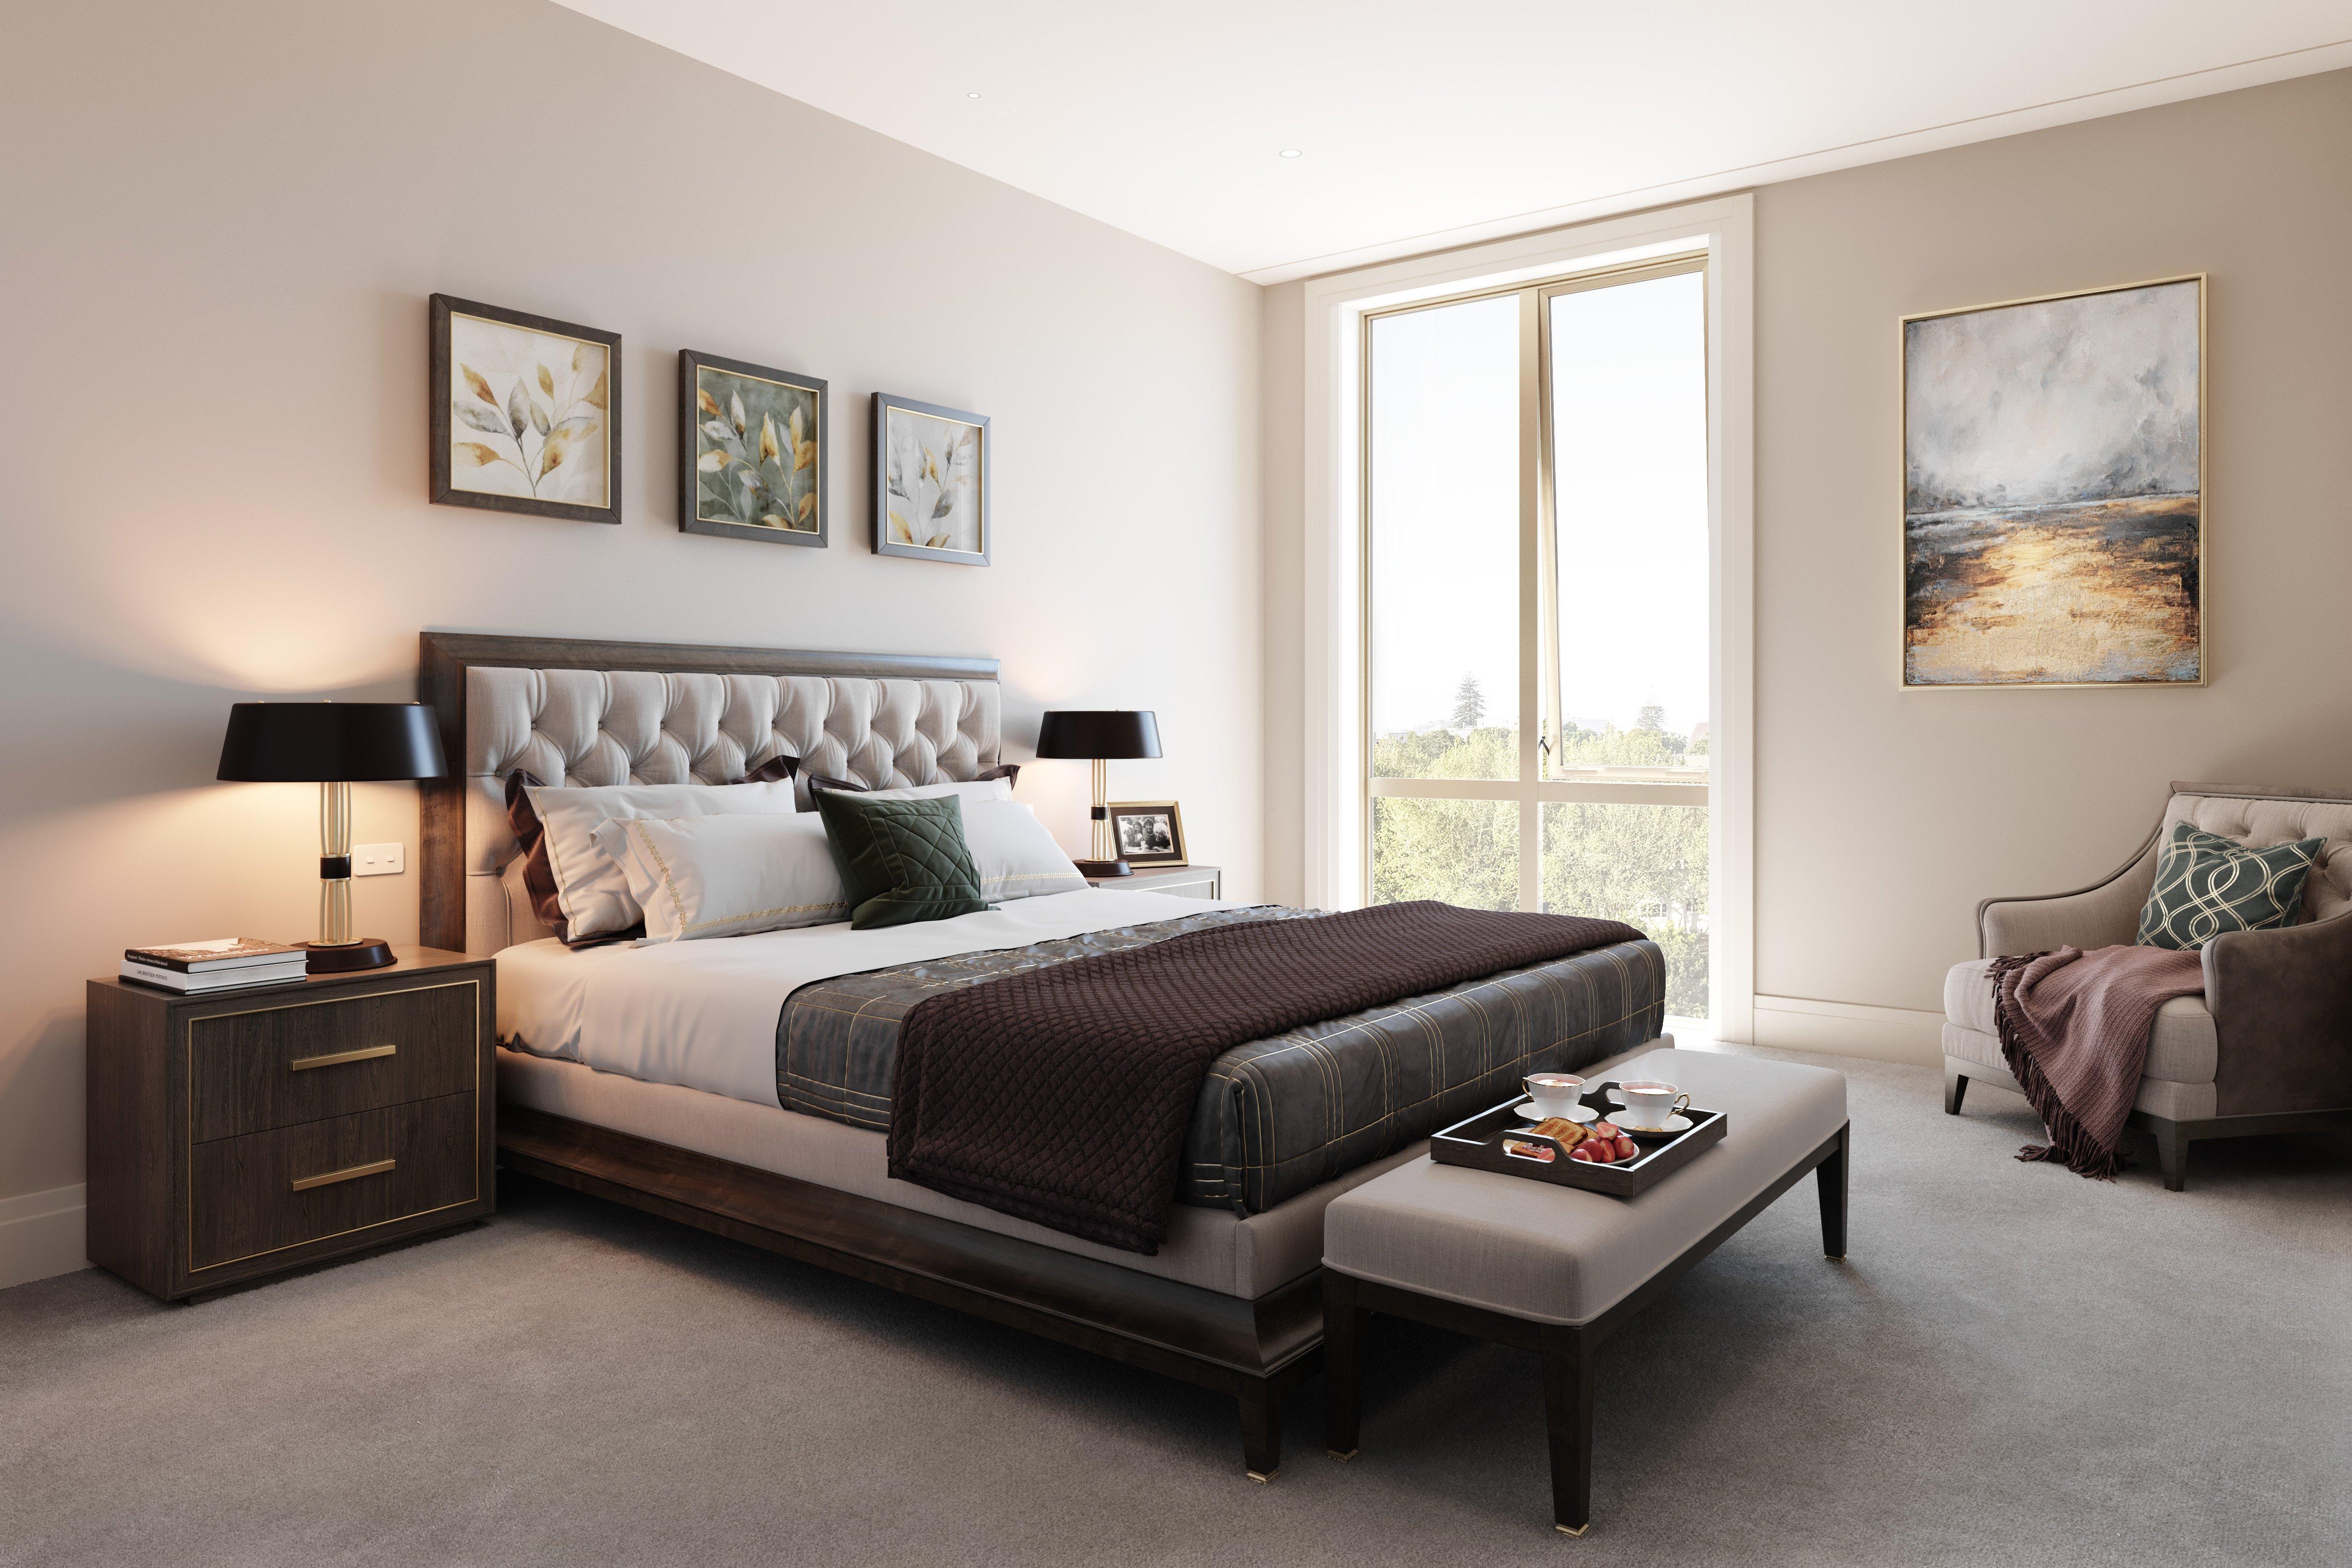 Foundation Precinct_Int_Type A_Bedroom_2021_Final01.jpg